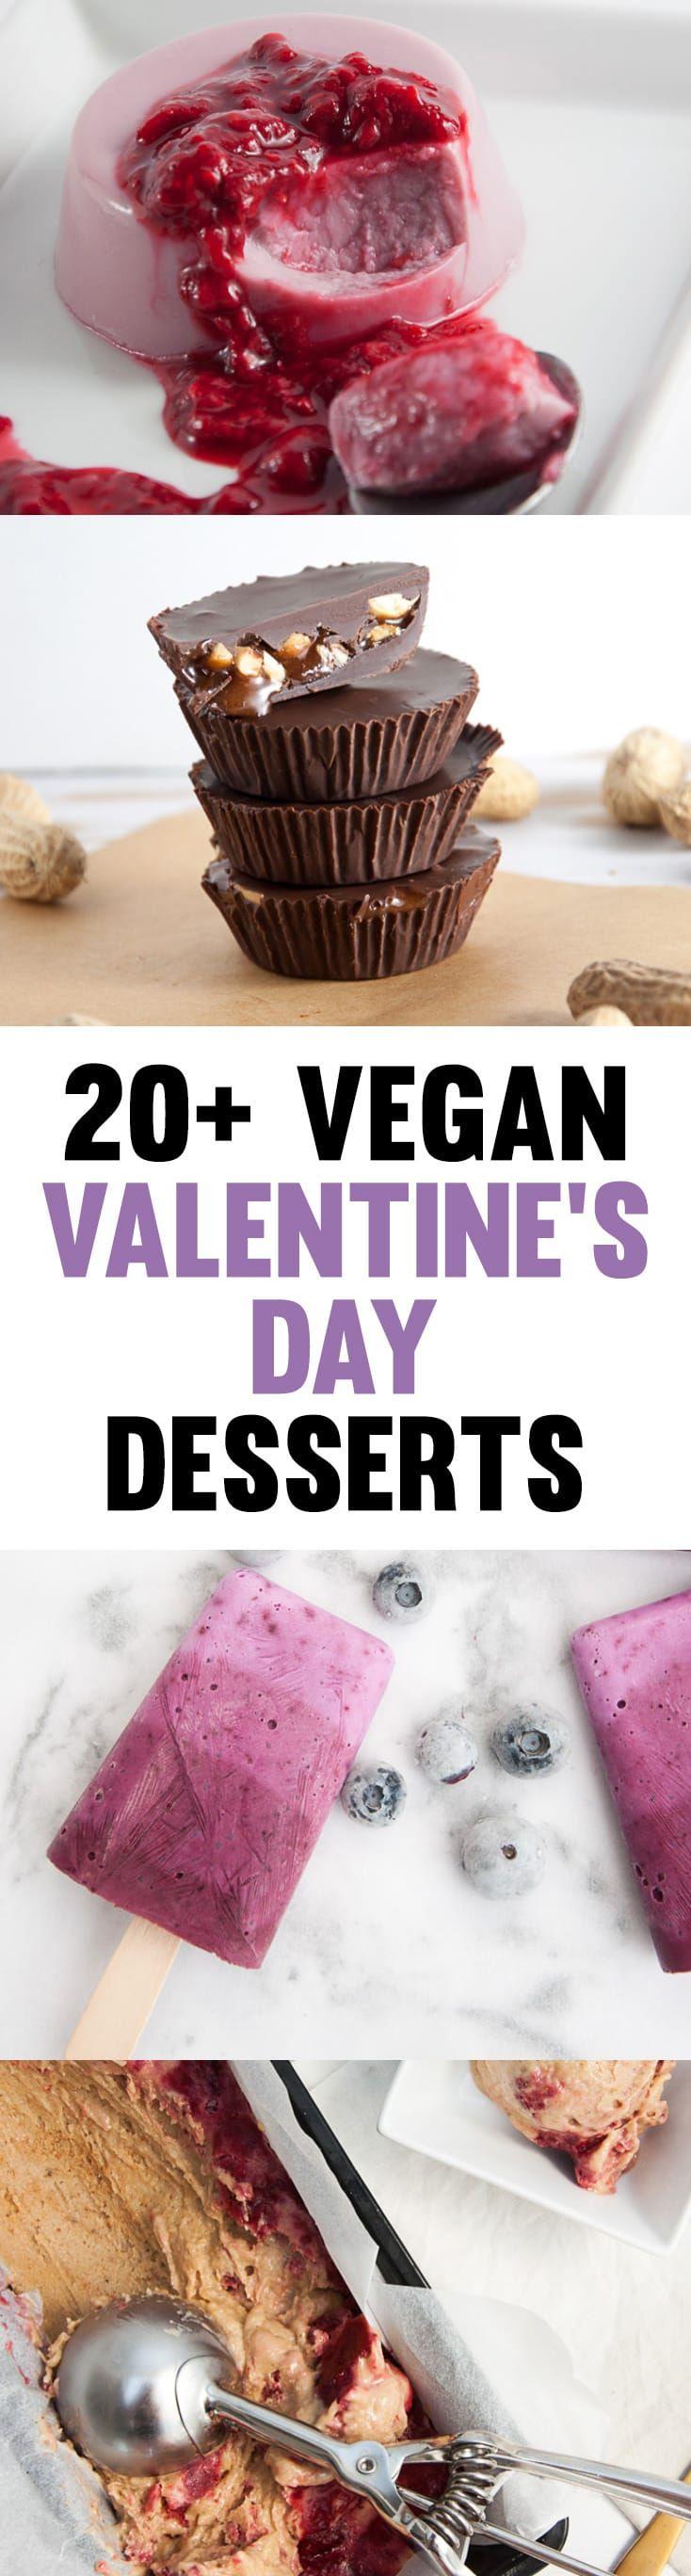 20+ Vegan Valentine's Day Desserts to make for your loved ones! | ElephantasticVegan.com #vegan #valentinesday #desserts #sweets #plantbased via @elephantasticv